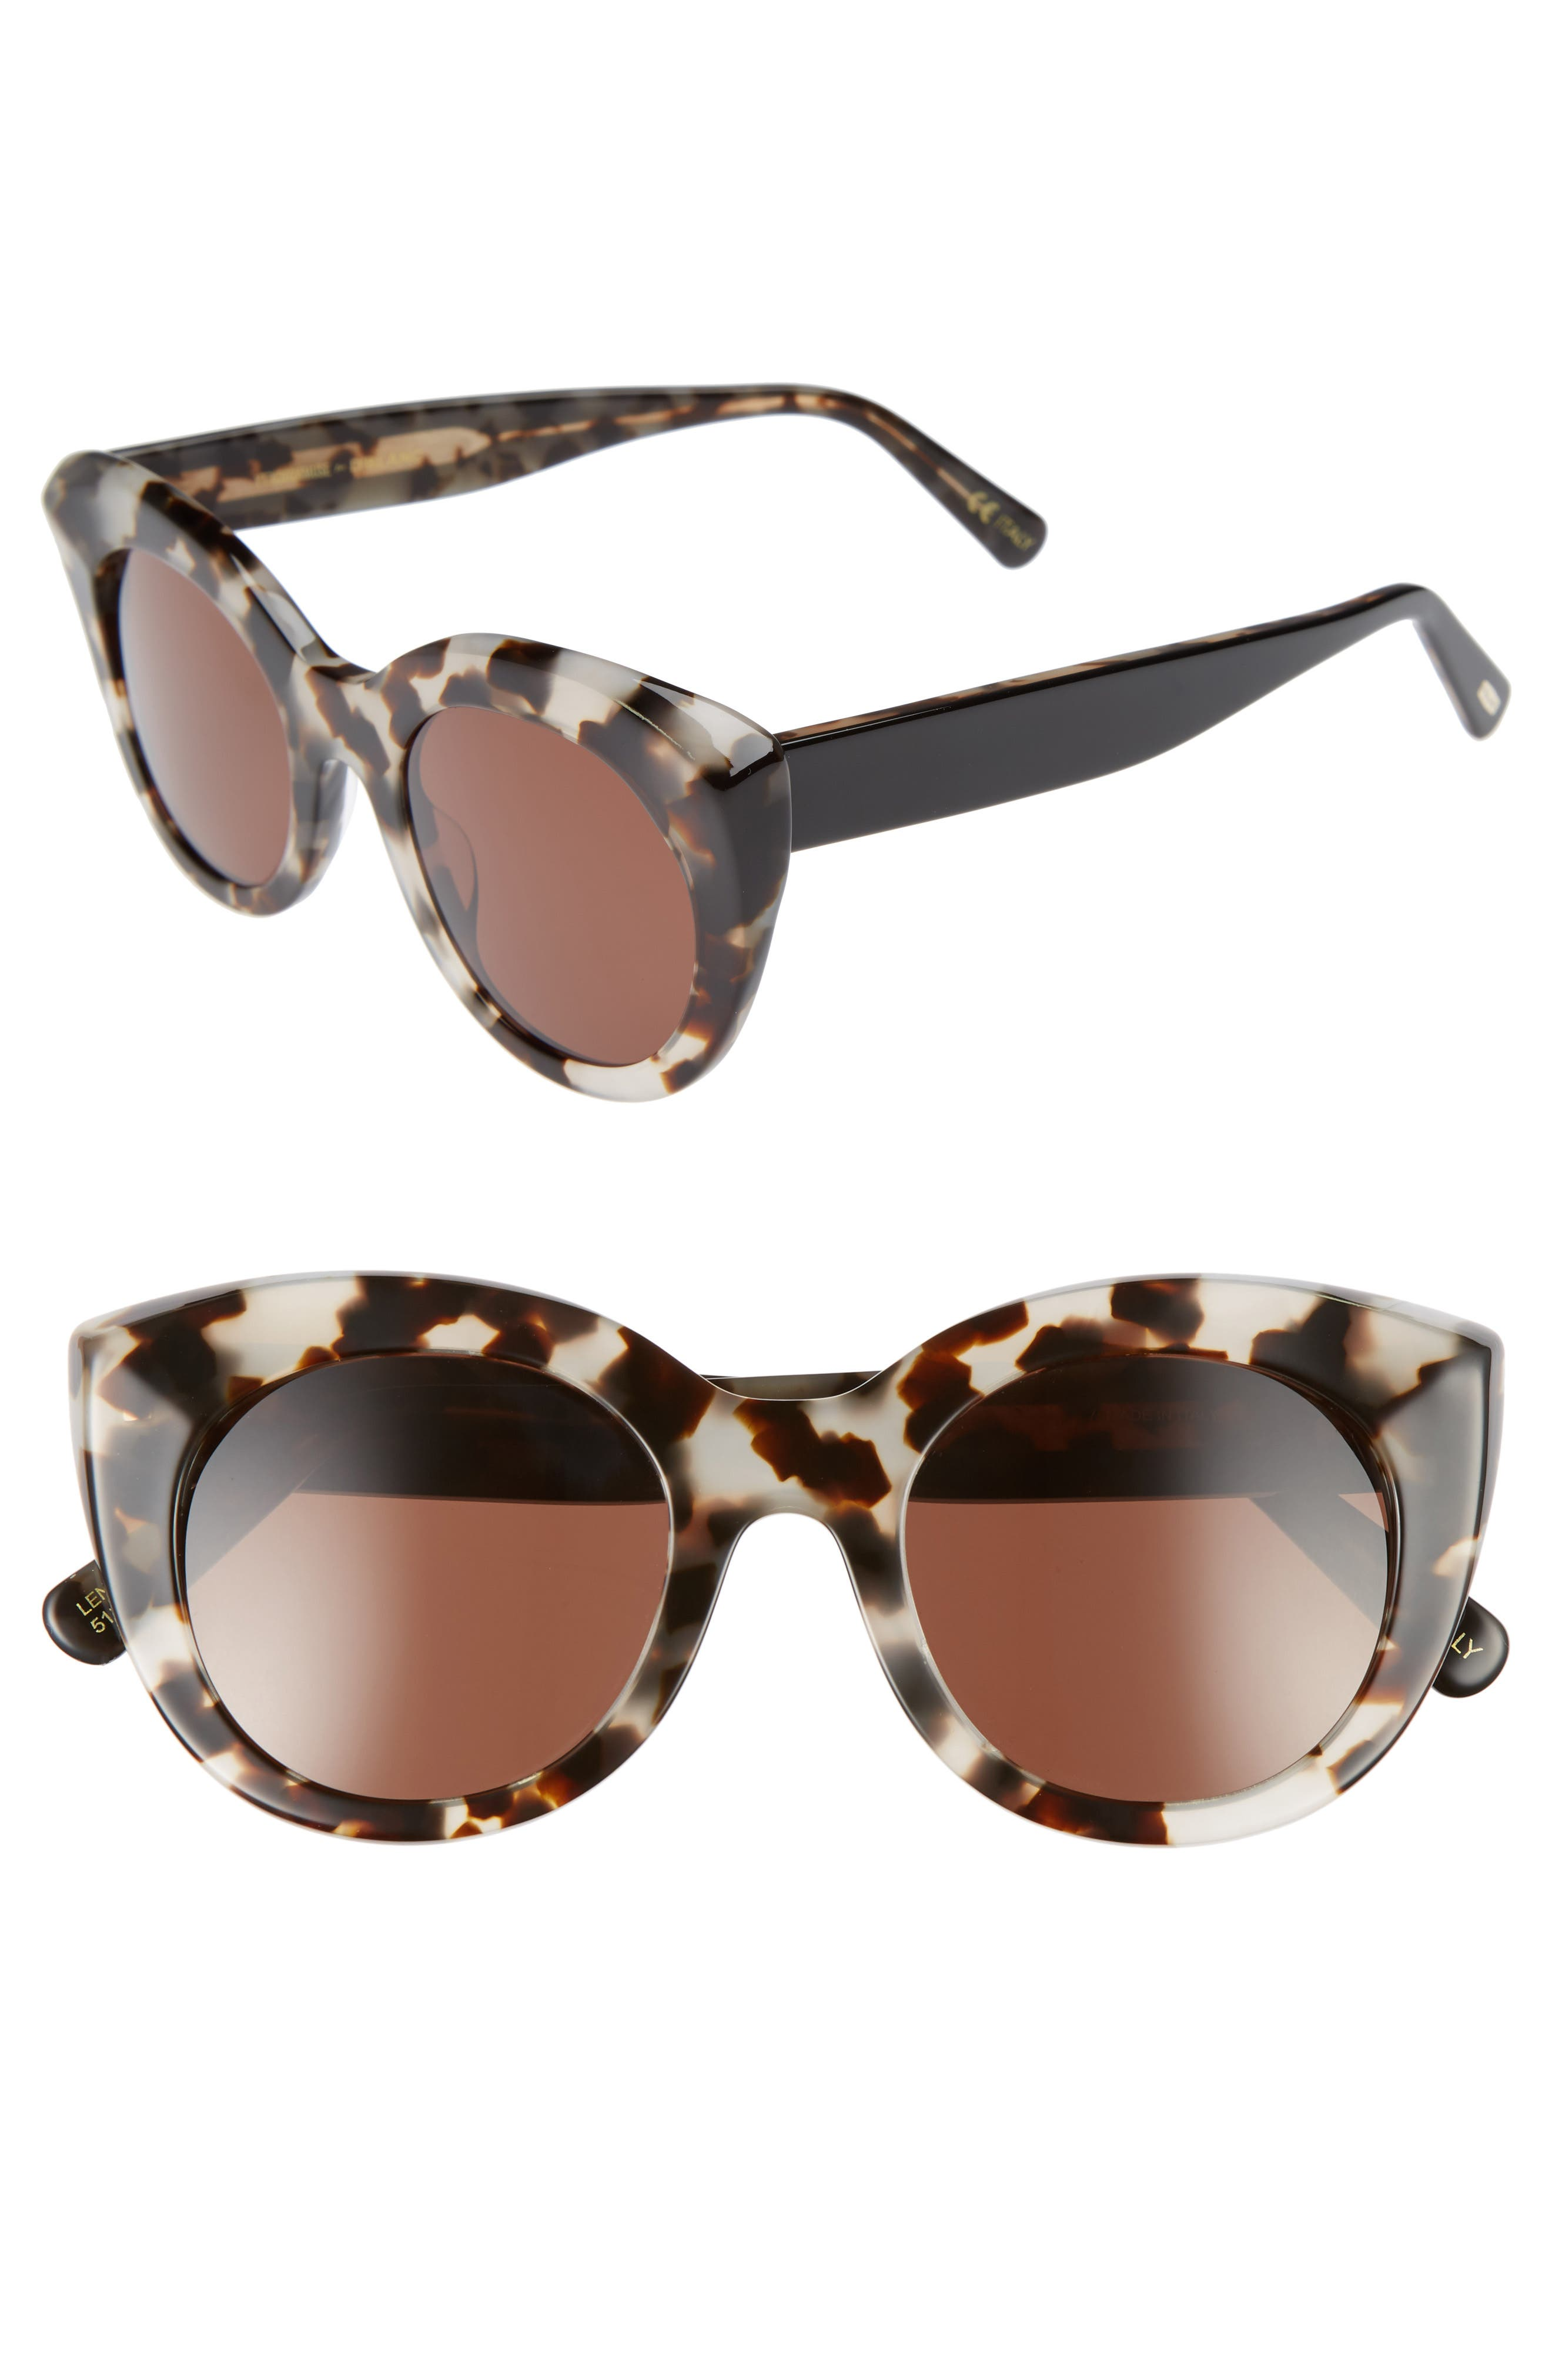 D'BLANC Modern Lover 49mm Cat-Eye Sunglasses,                         Main,                         color, Snow Leopard/ Brown